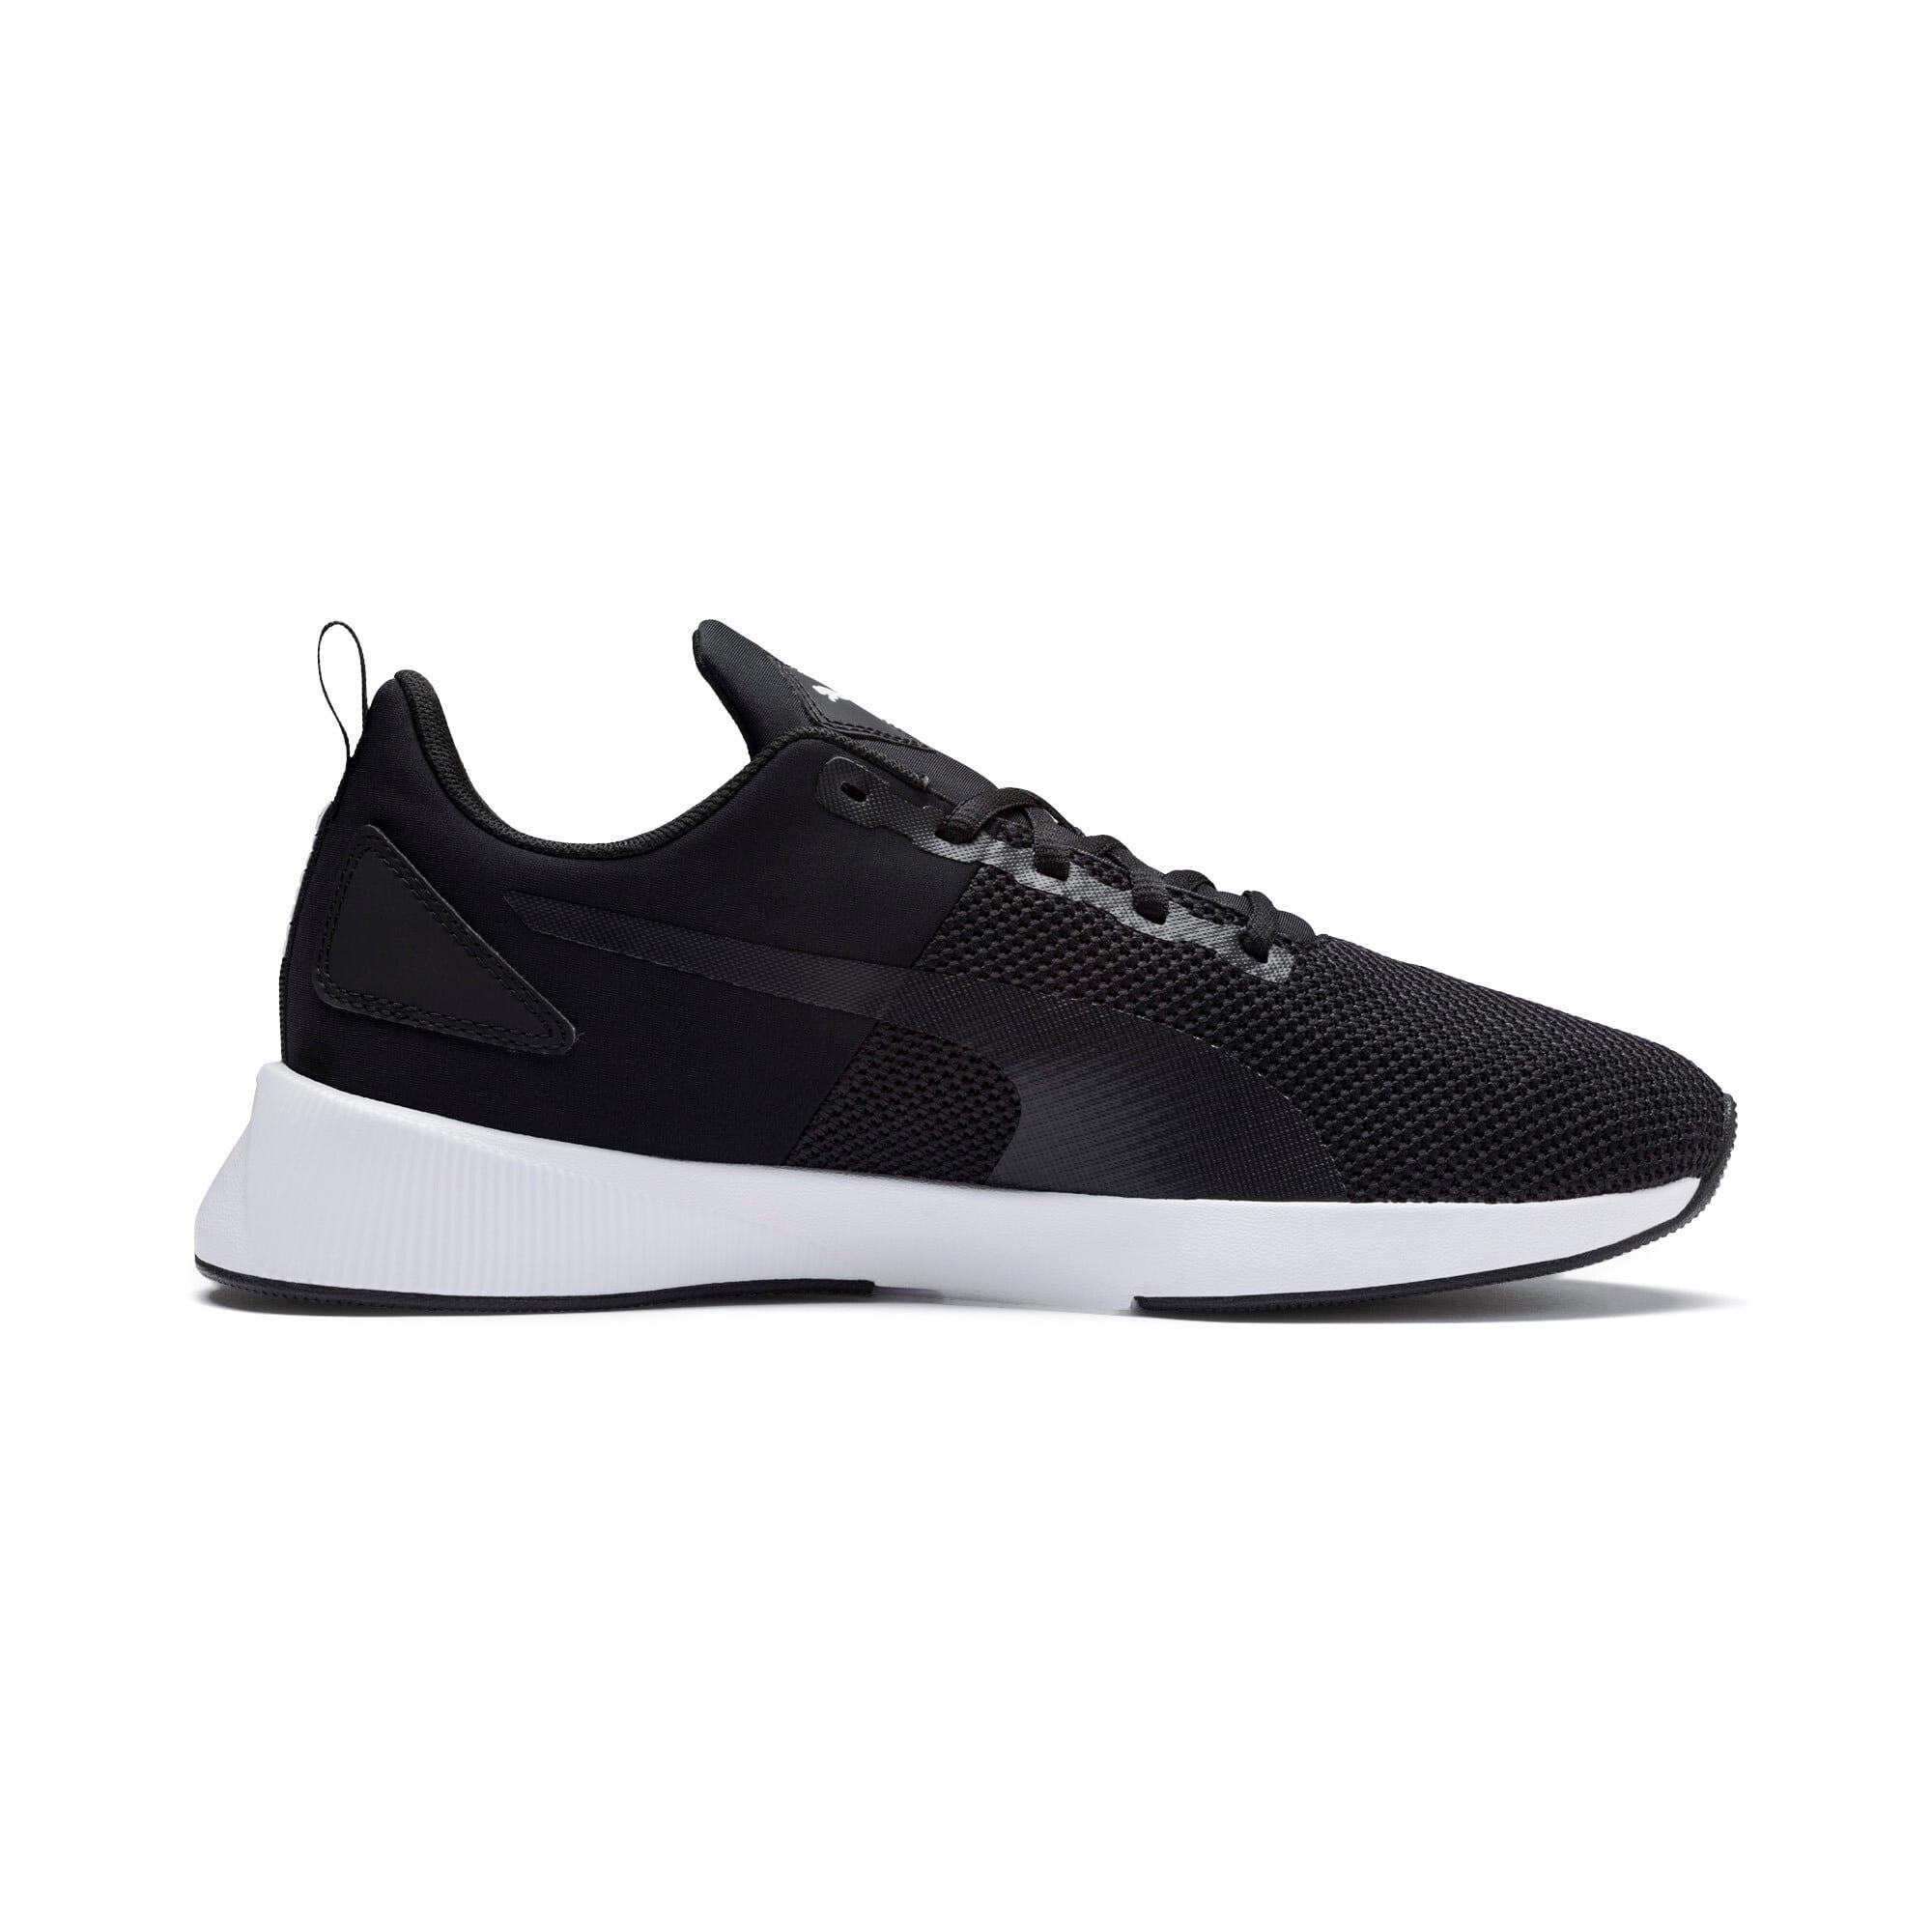 Thumbnail 5 of Flyer Running Shoes, Black-Black-White, medium-IND